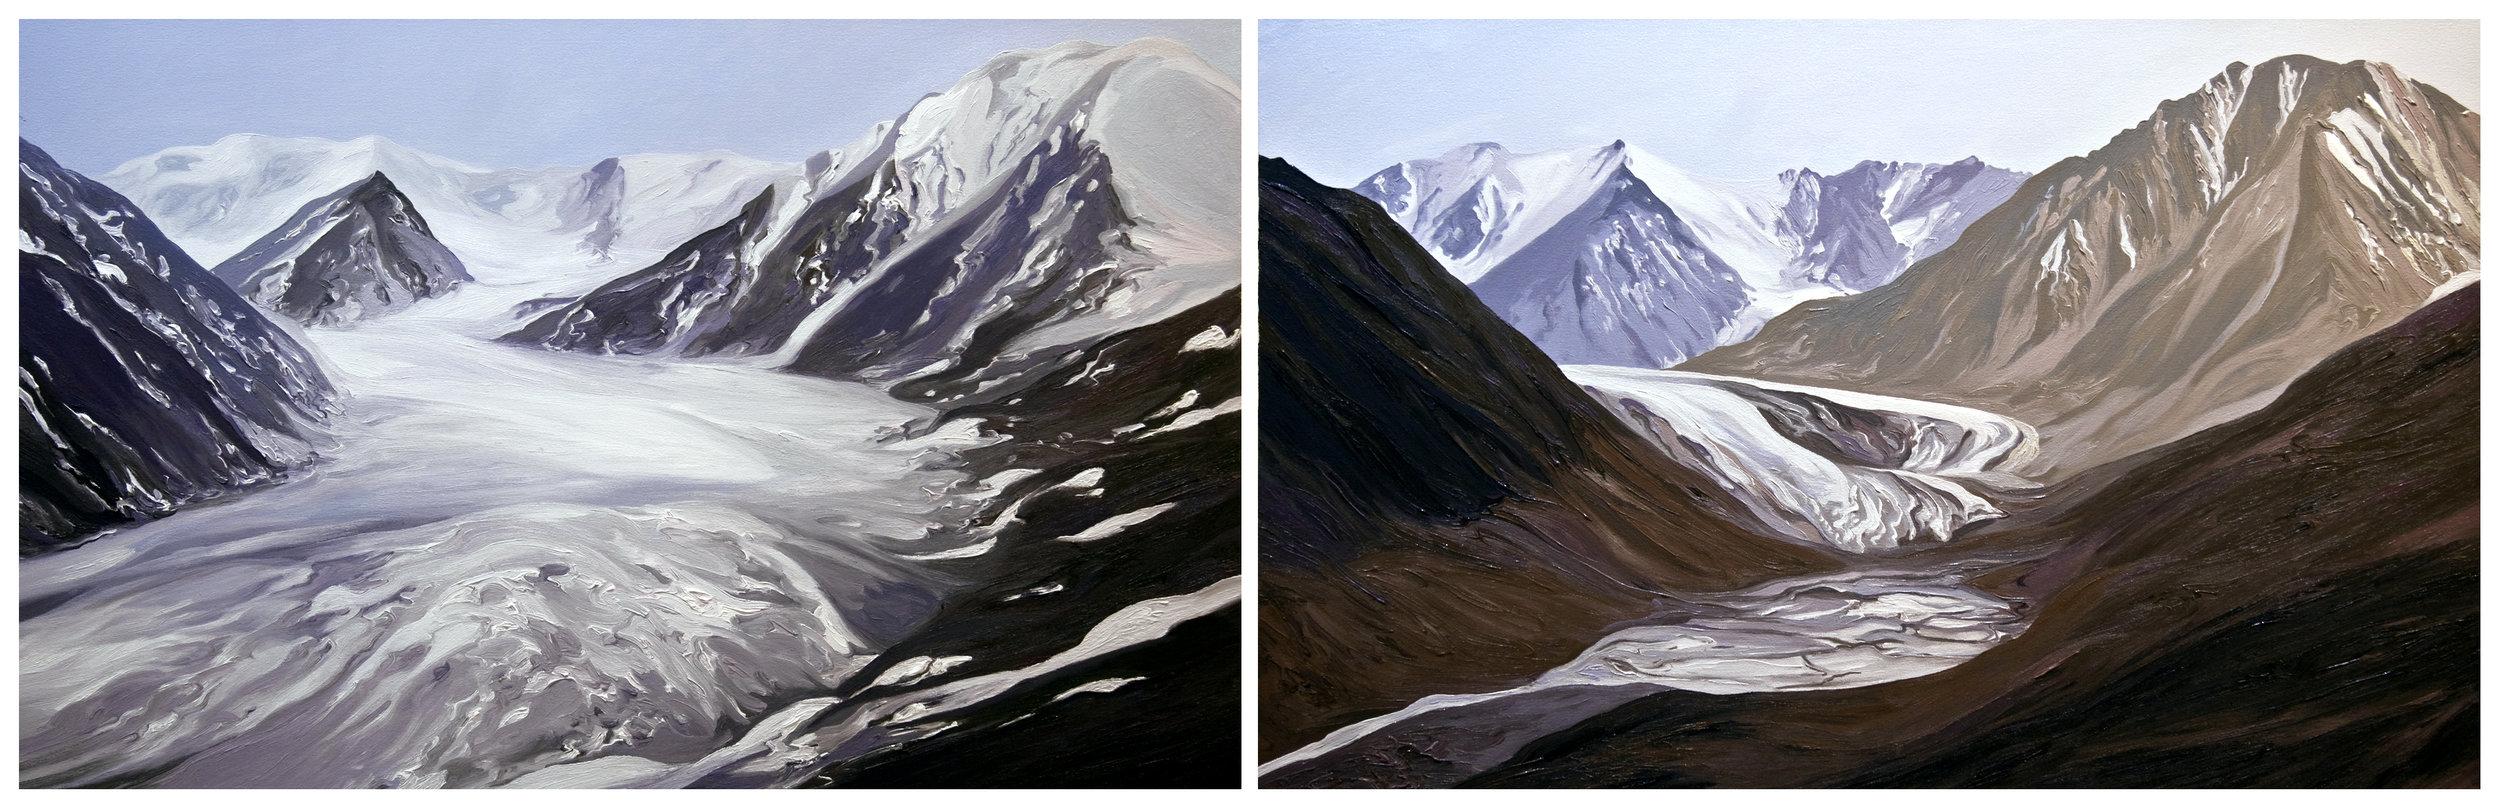 Okpilak Glacier 1, 2